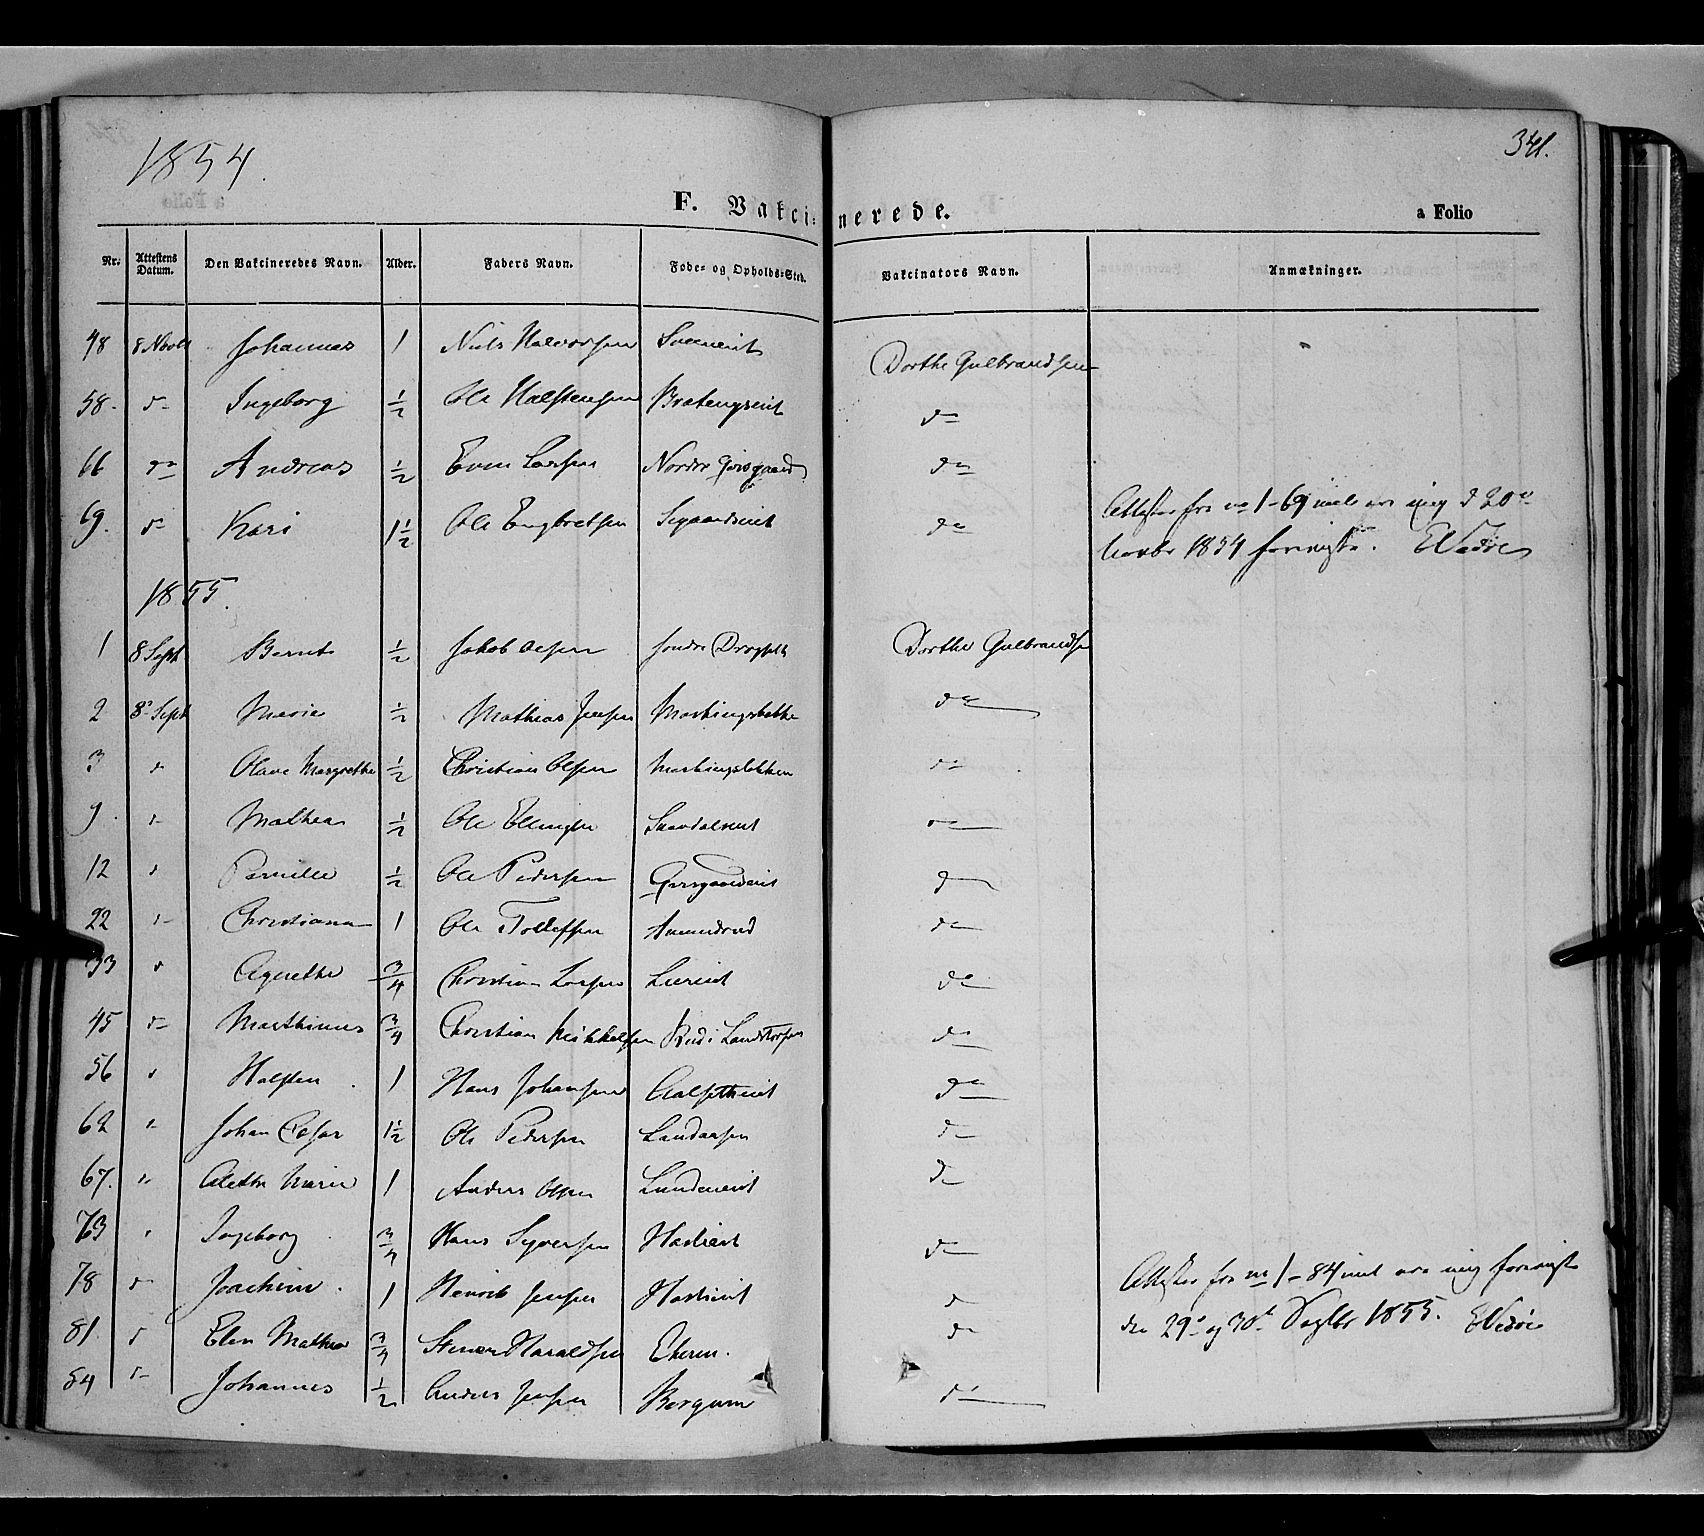 SAH, Biri prestekontor, Ministerialbok nr. 5, 1843-1854, s. 341